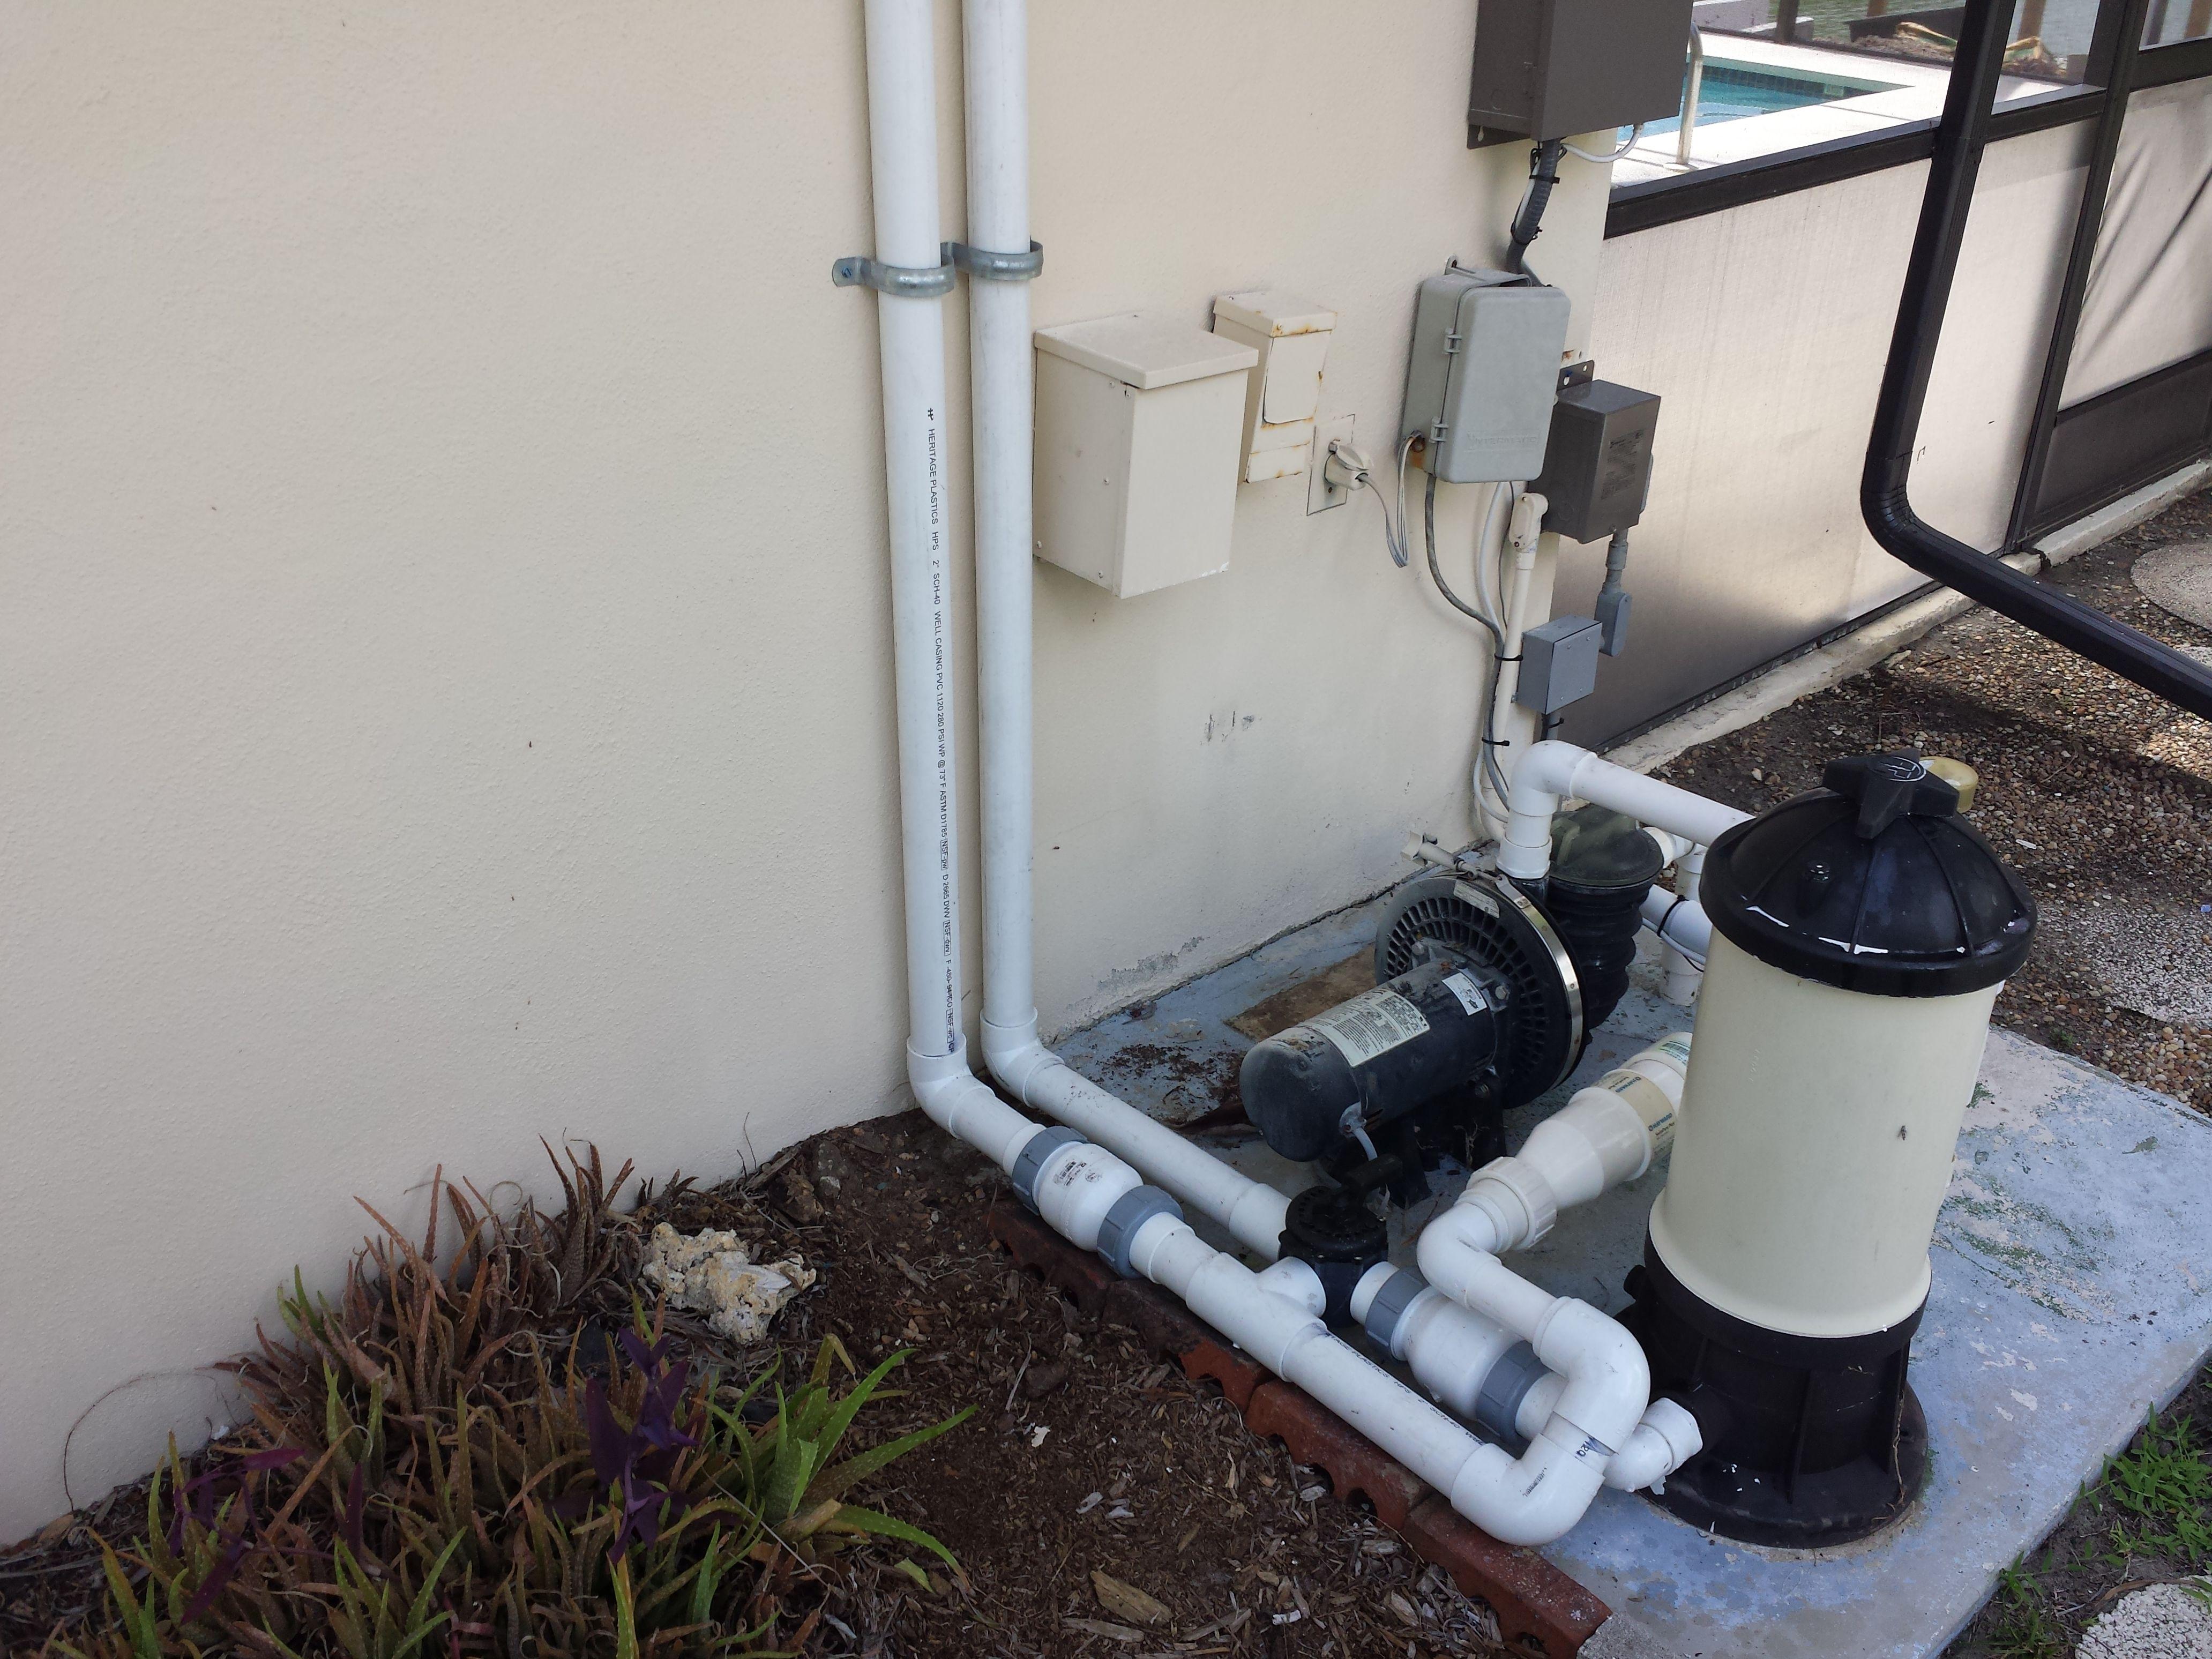 Vortex Solar Pool Heater Bottom End Plumbing www